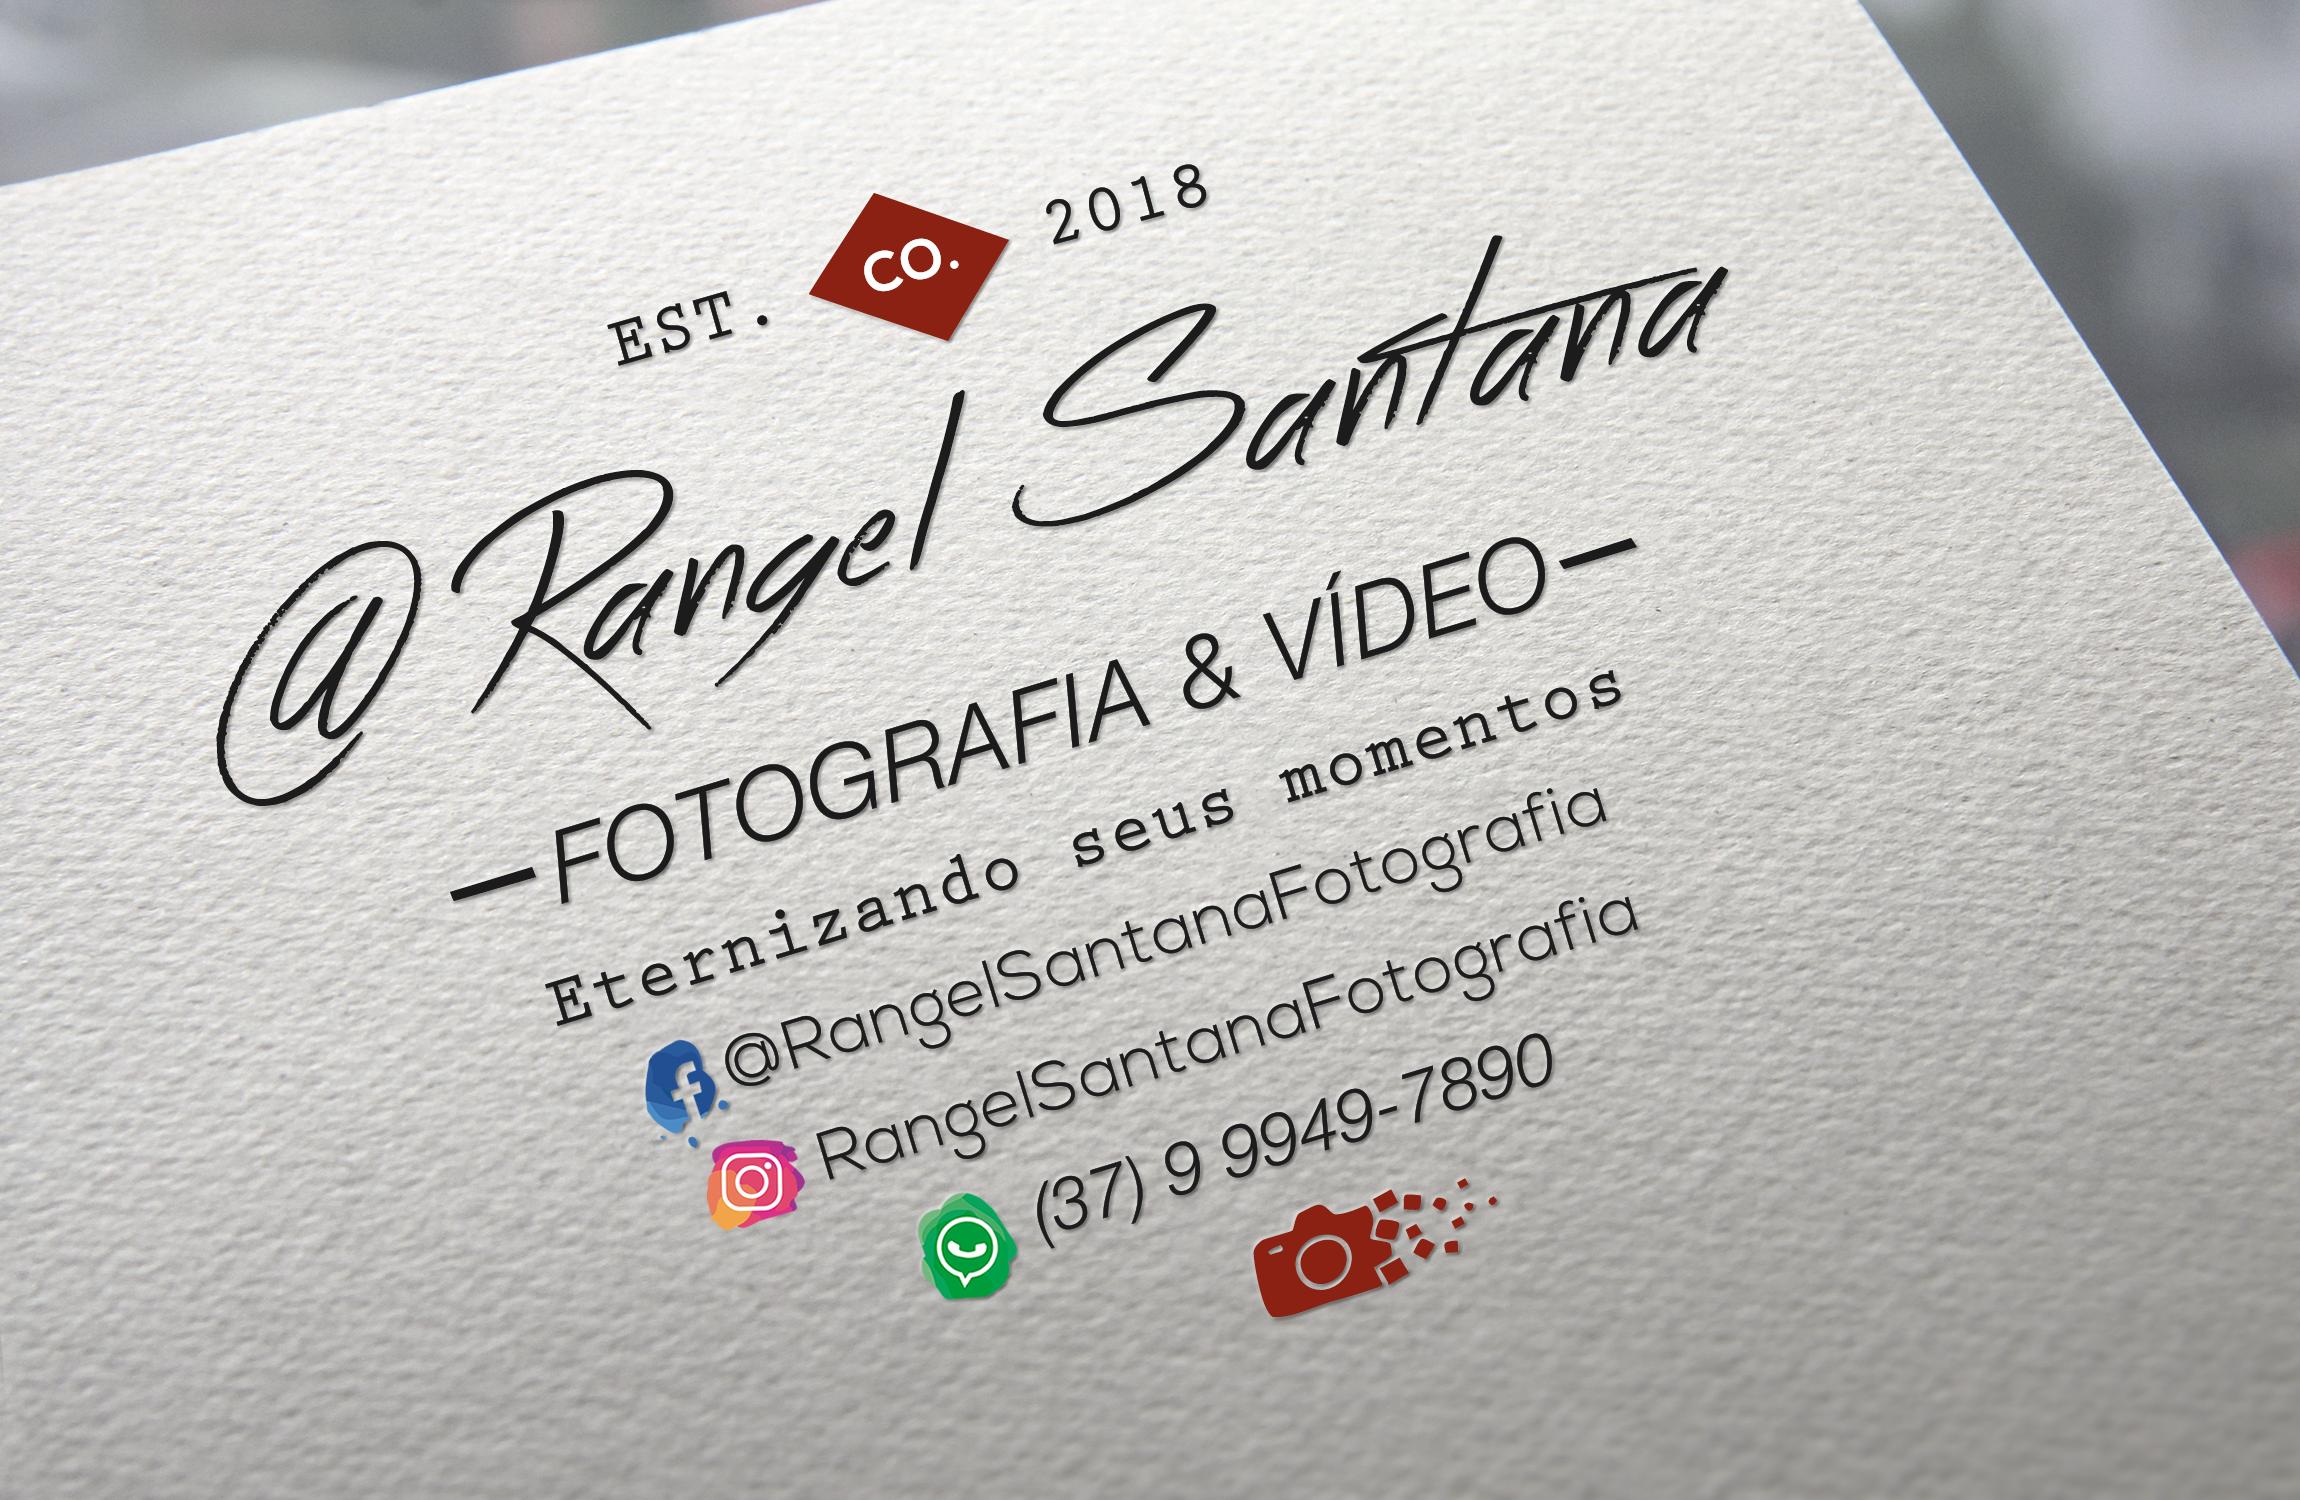 Contate Rangel Santana Fotografia